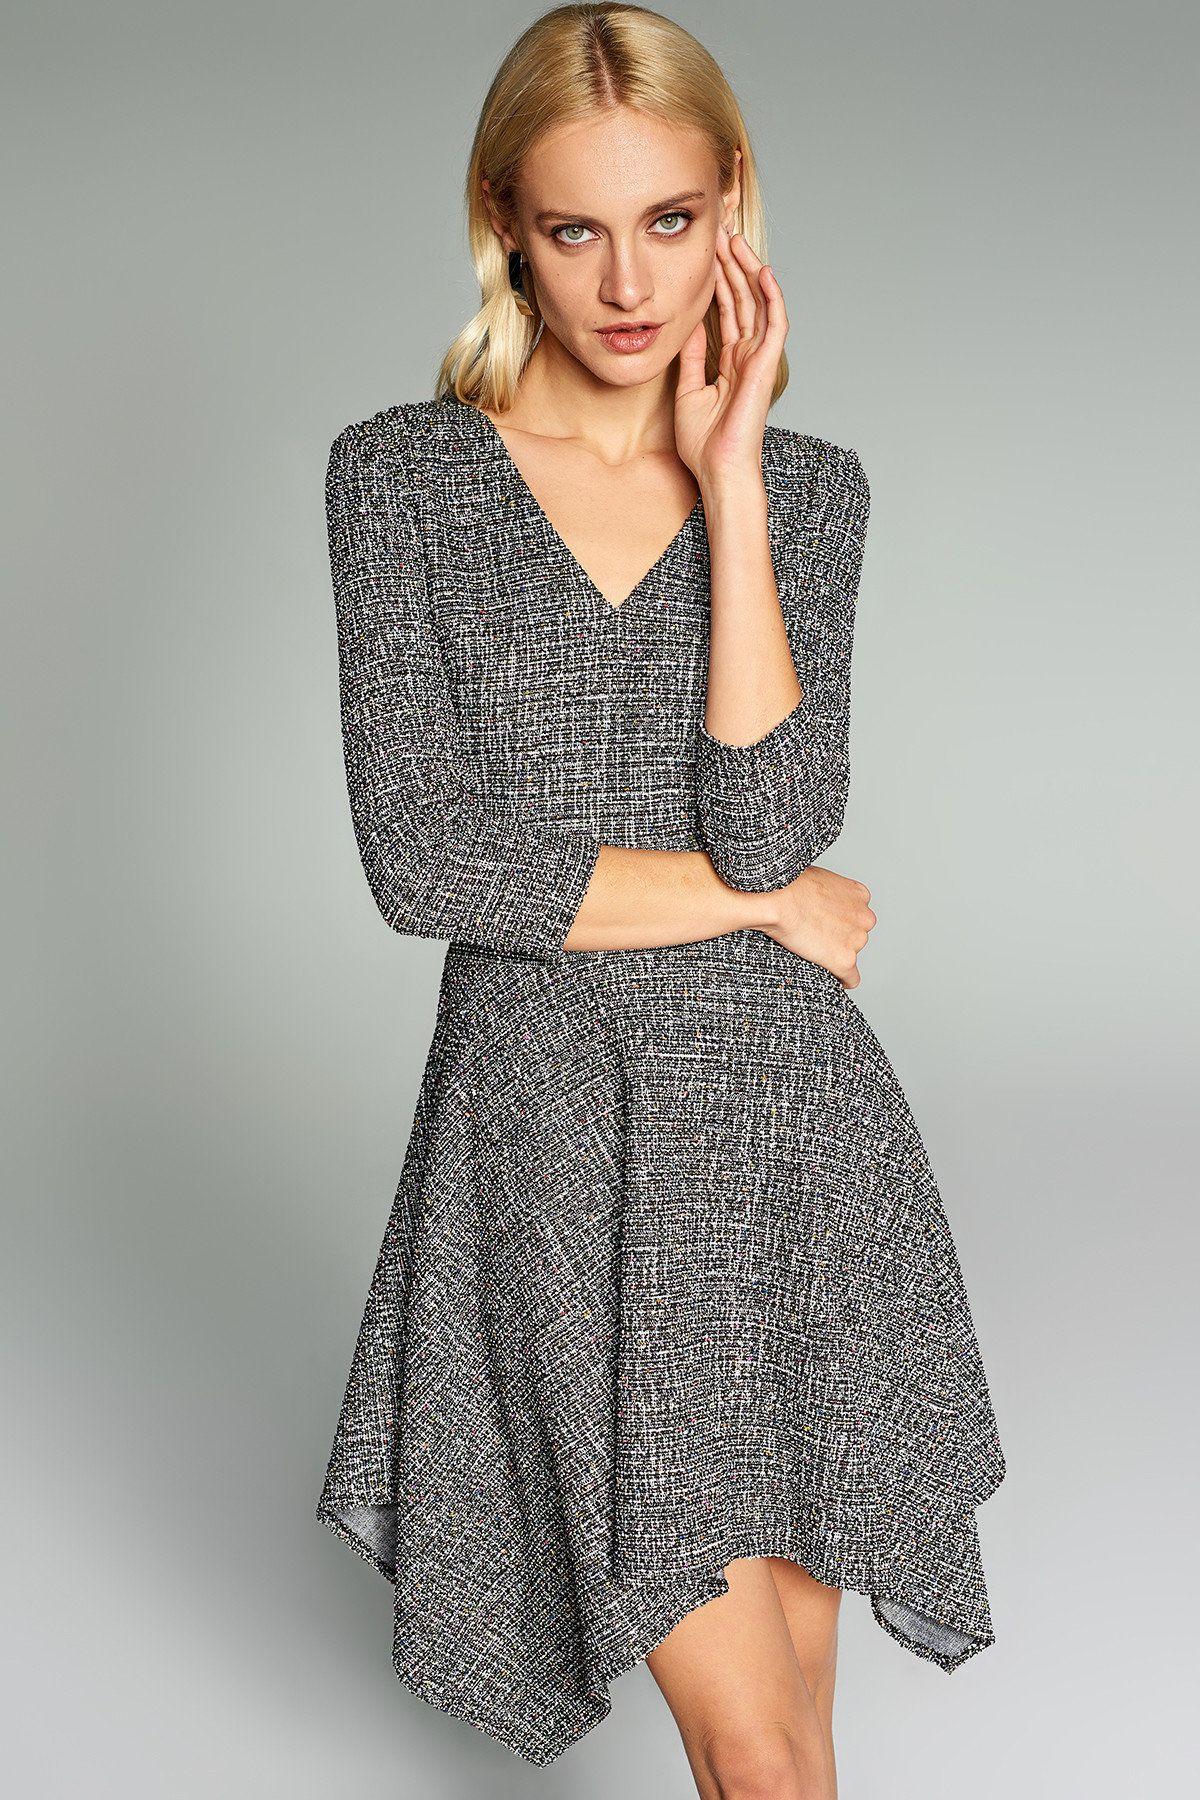 Siyah Asimetrik Detayli Elbise Trendyolmilla Trendyol Elbise Elbise Modelleri Wrap Elbise